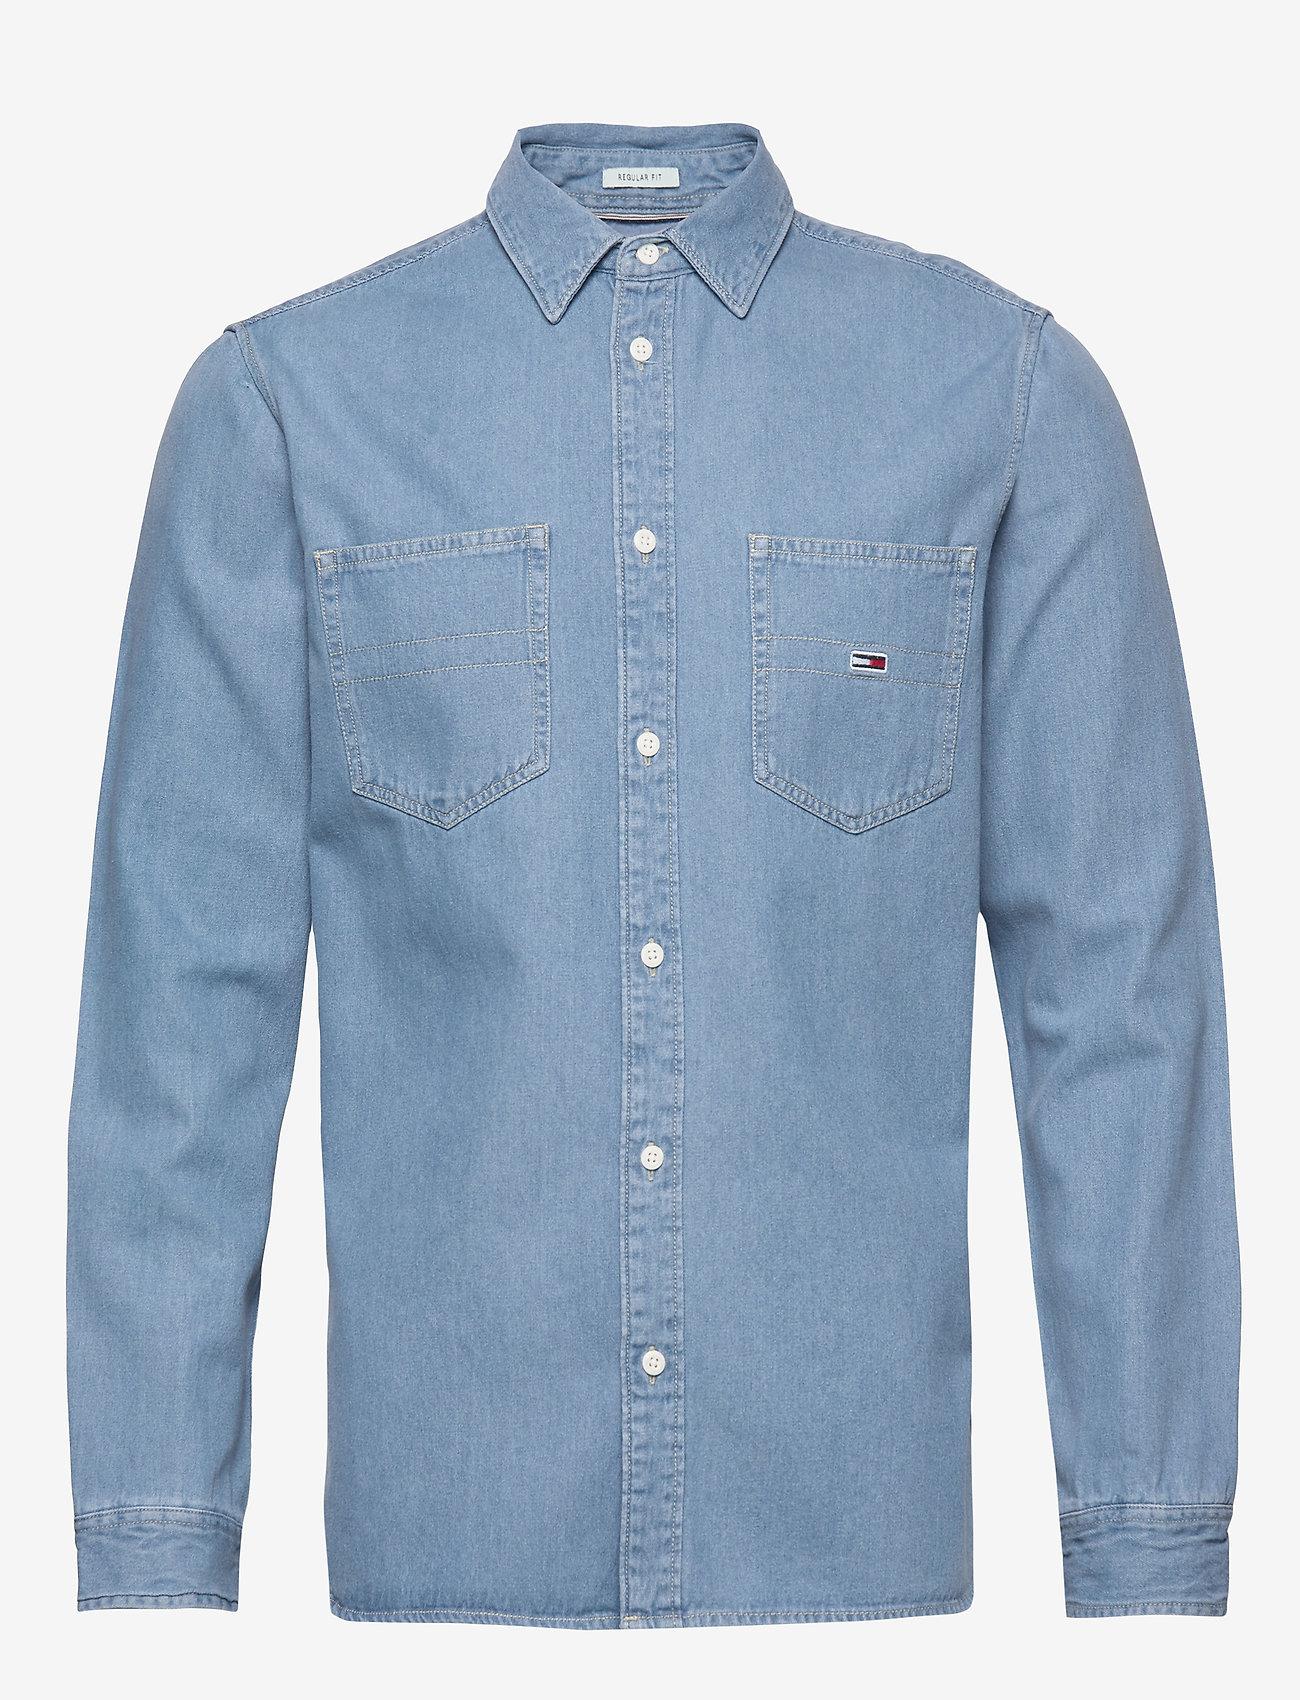 Tommy Jeans - TJM DENIM SHIRT - podstawowe koszulki - mid indigo - 0